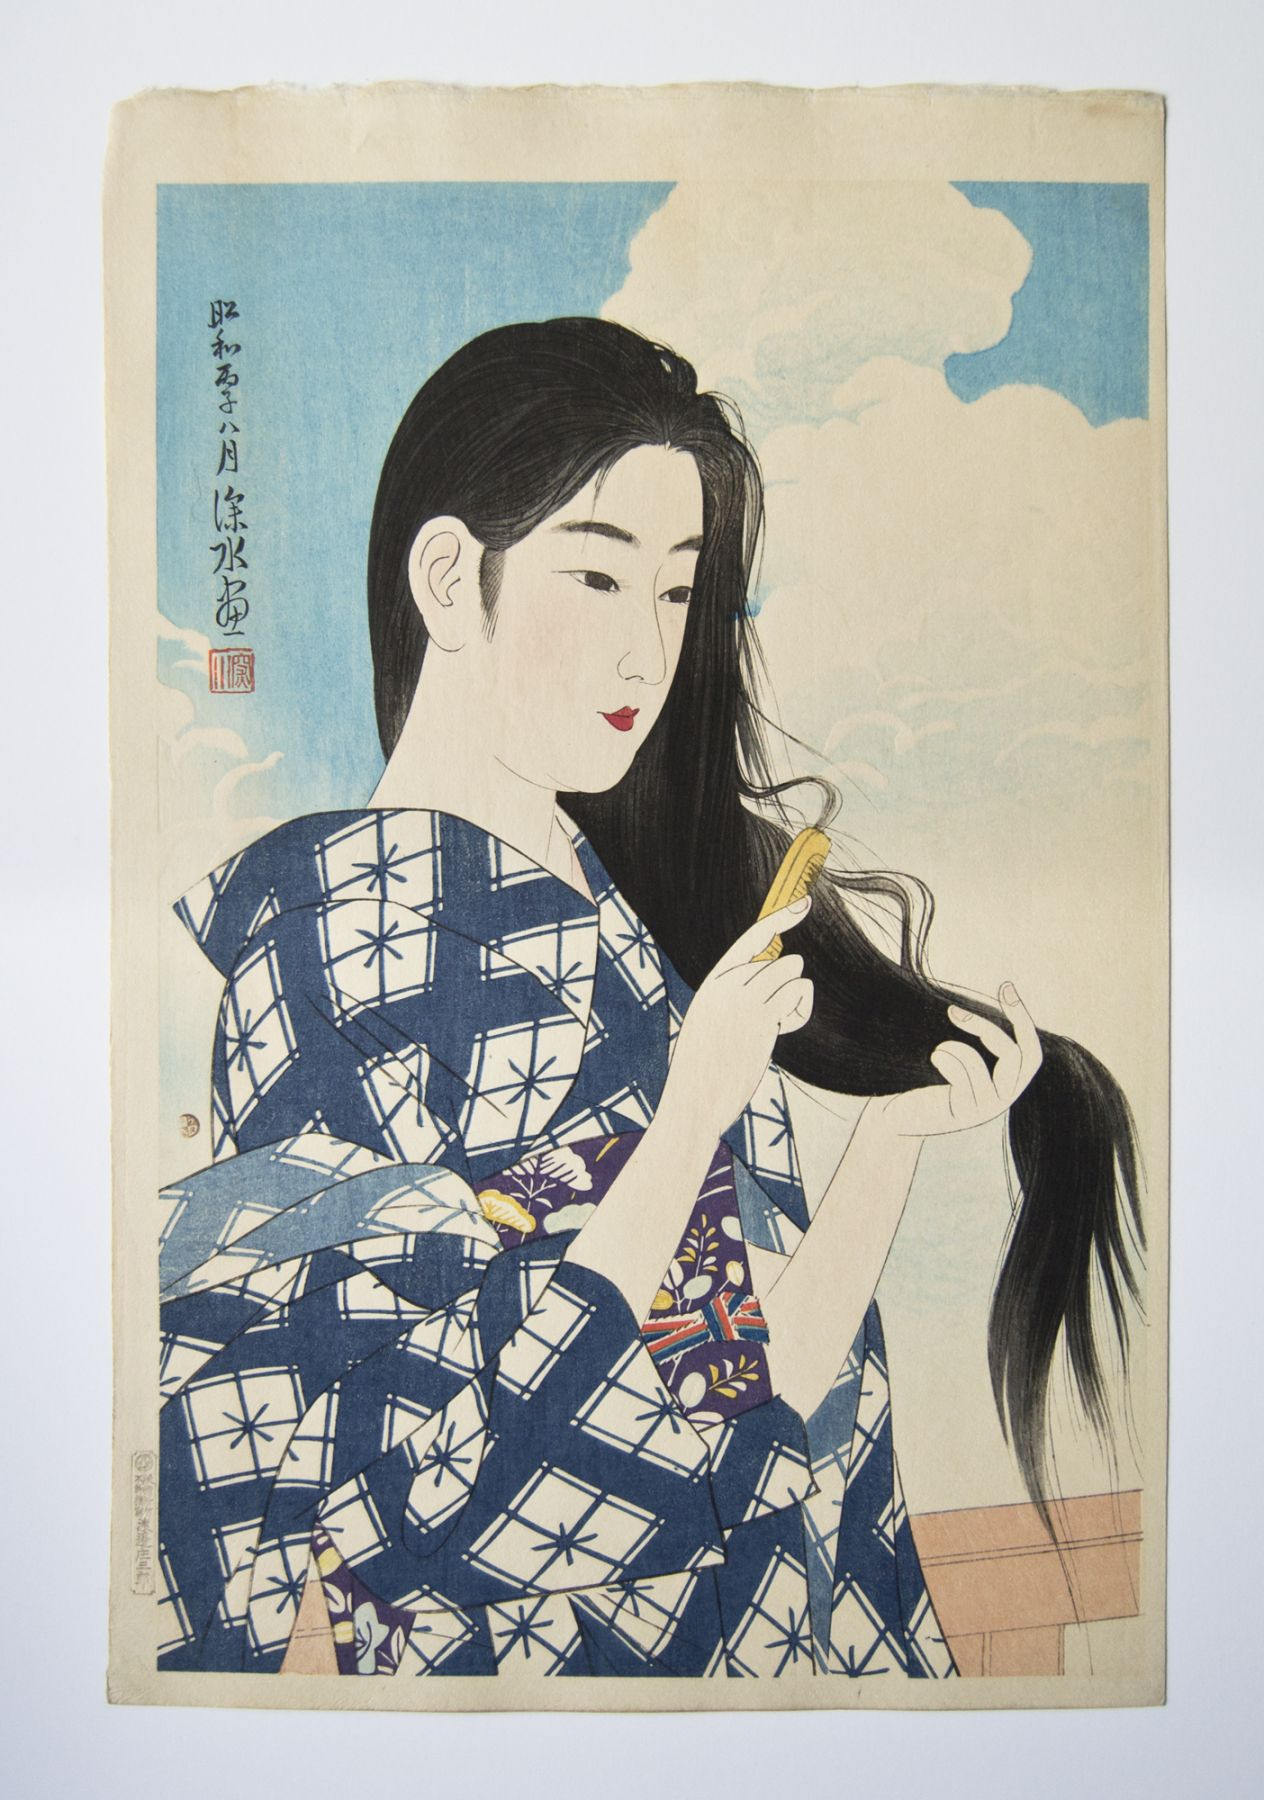 Ito Shinsui (1898-1972), Washing Hair